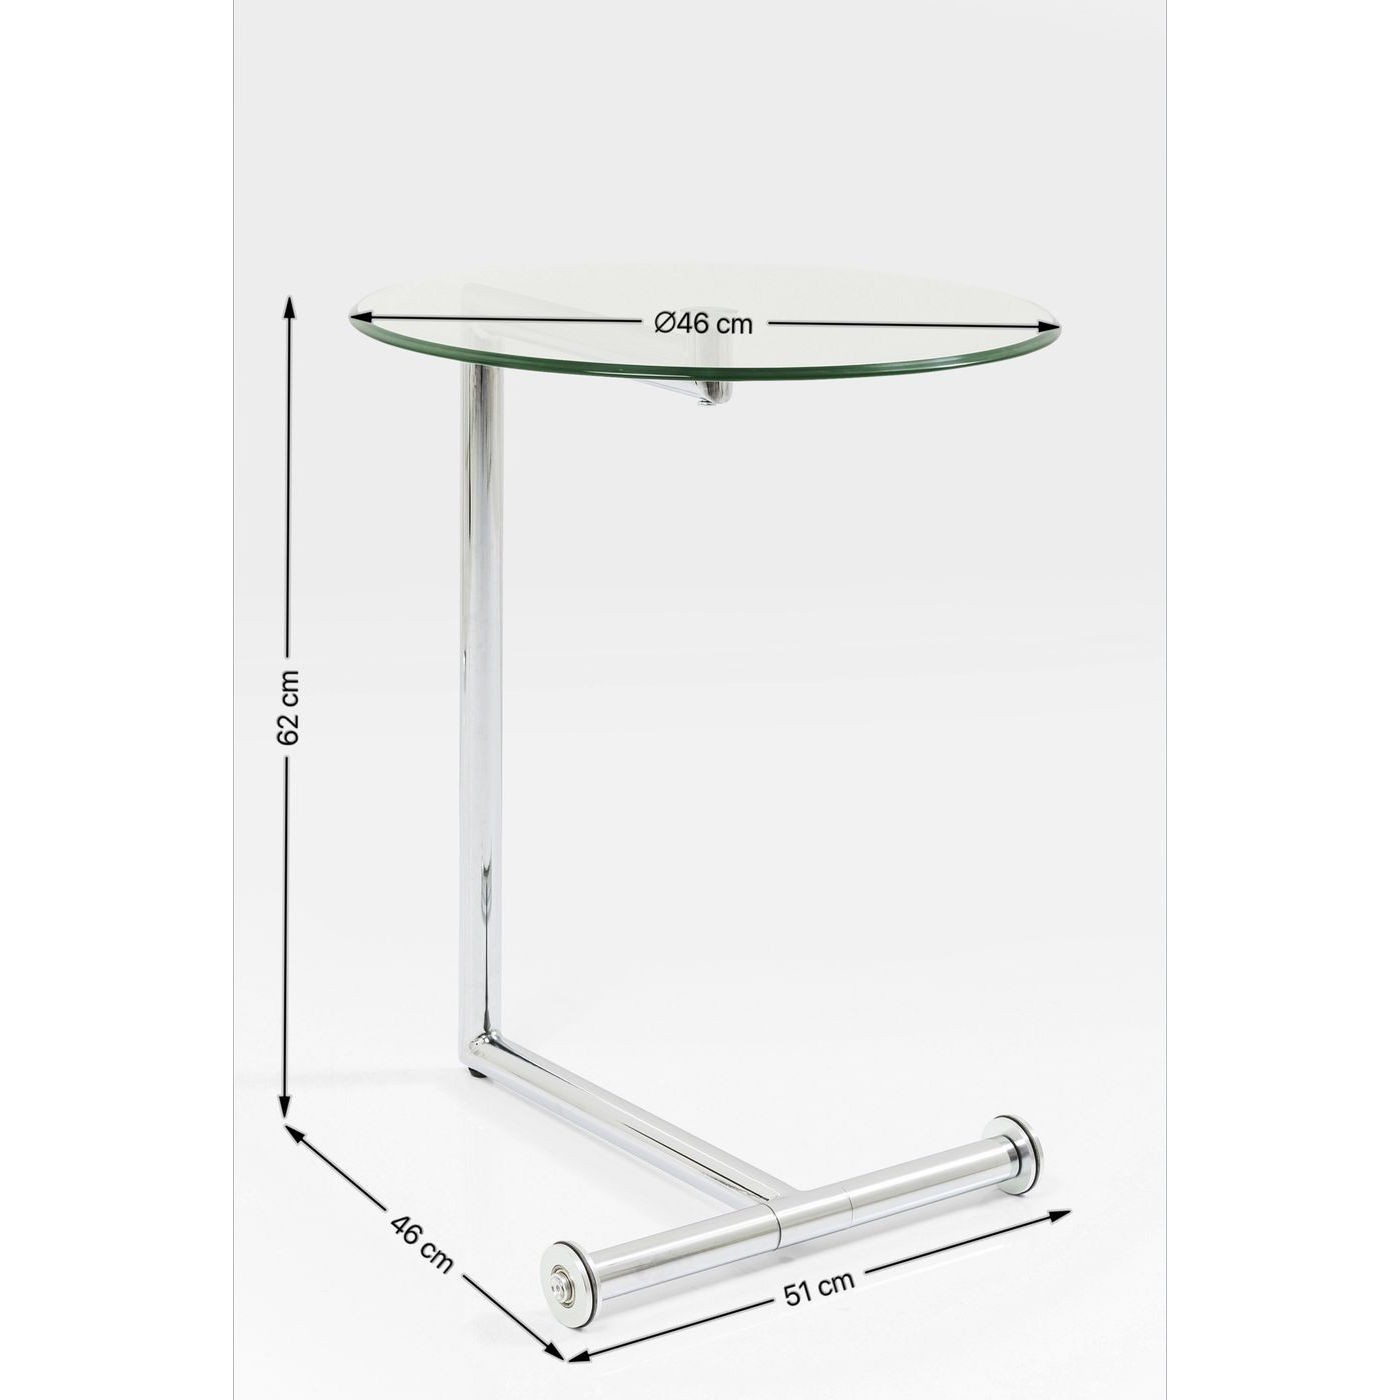 Table d'appoint Easy Living transparente Kare Design